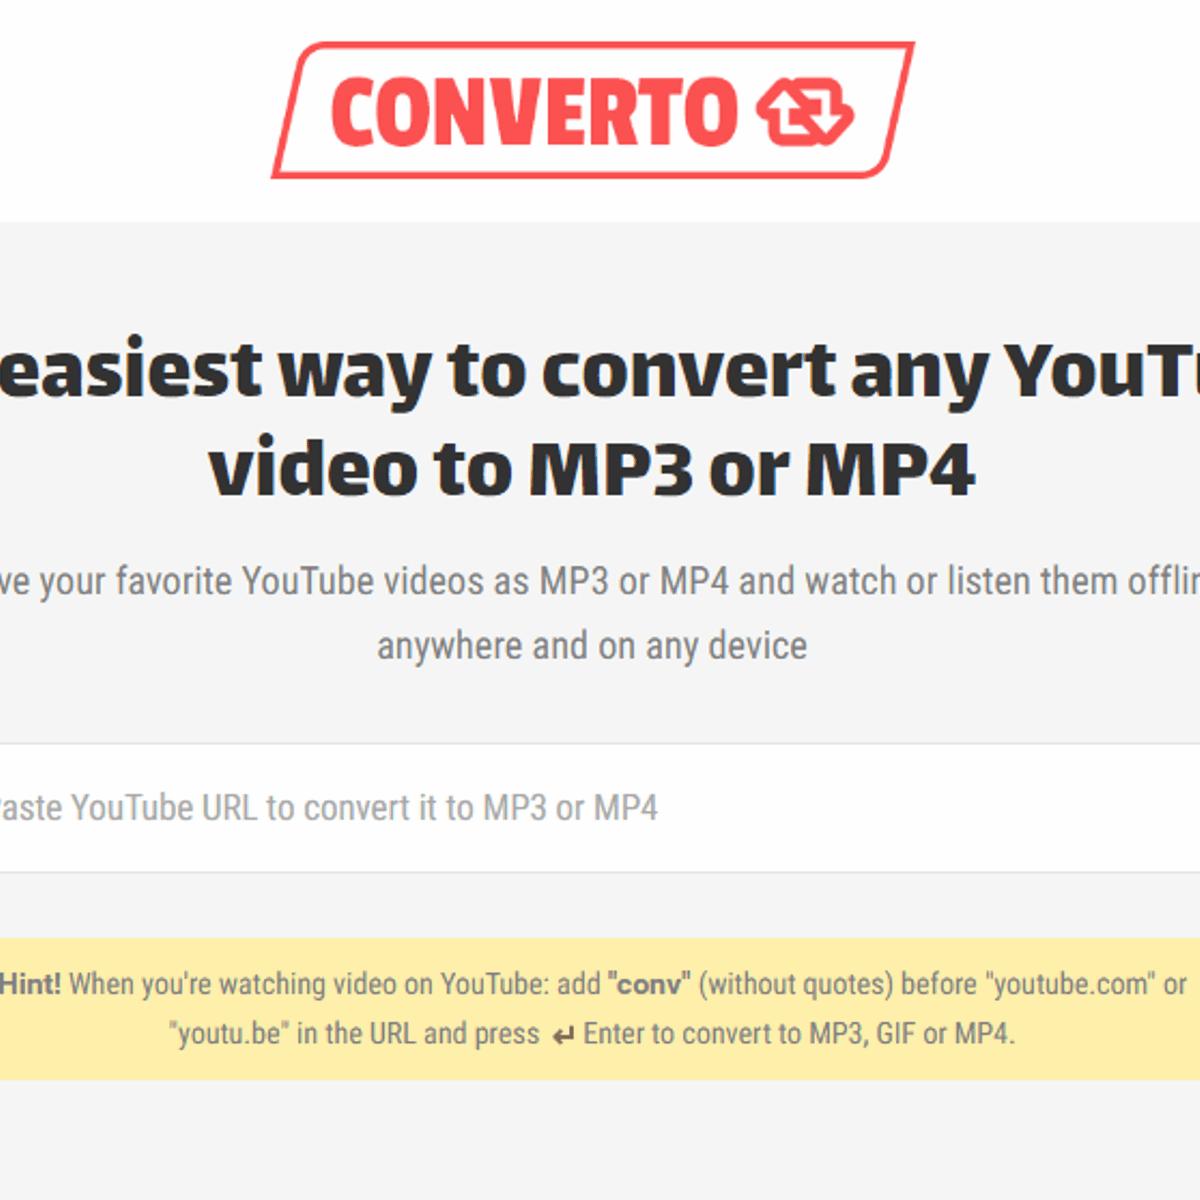 Converto io Reviews and Features - AlternativeTo